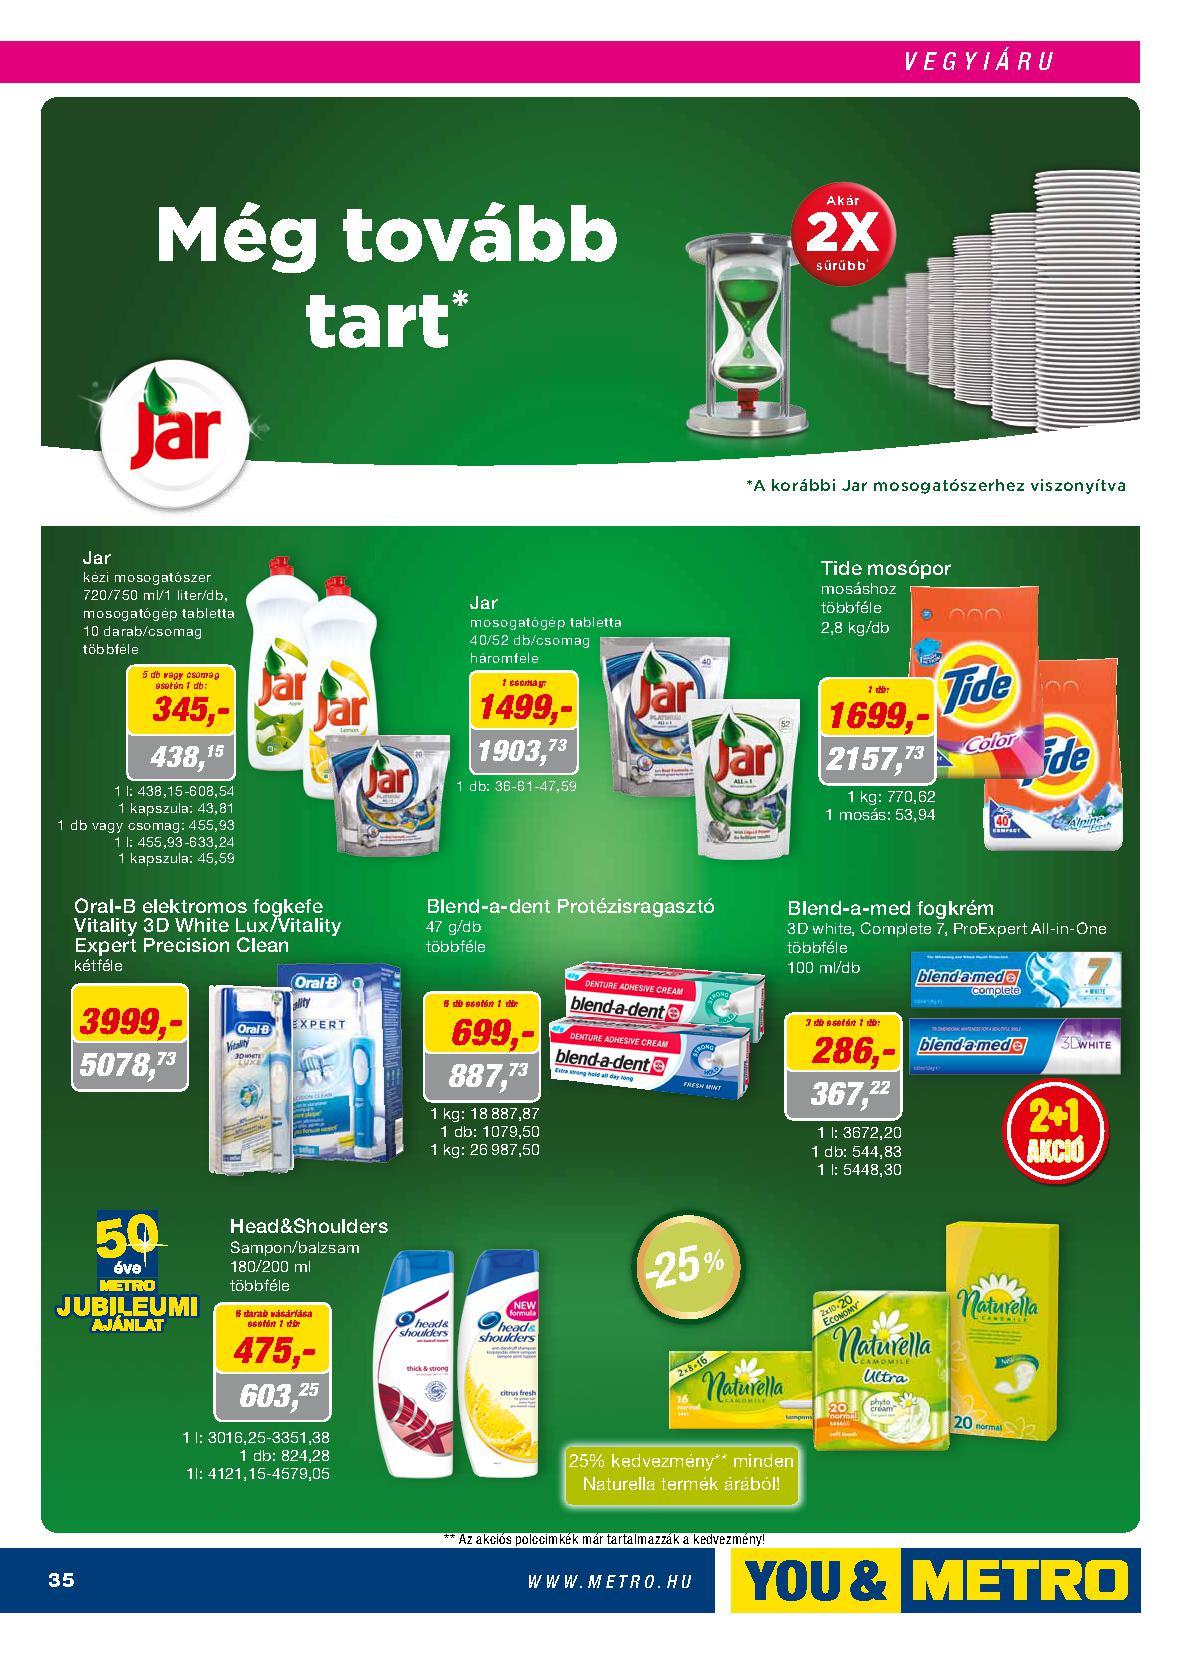 Metro Mađarska akcija super cena